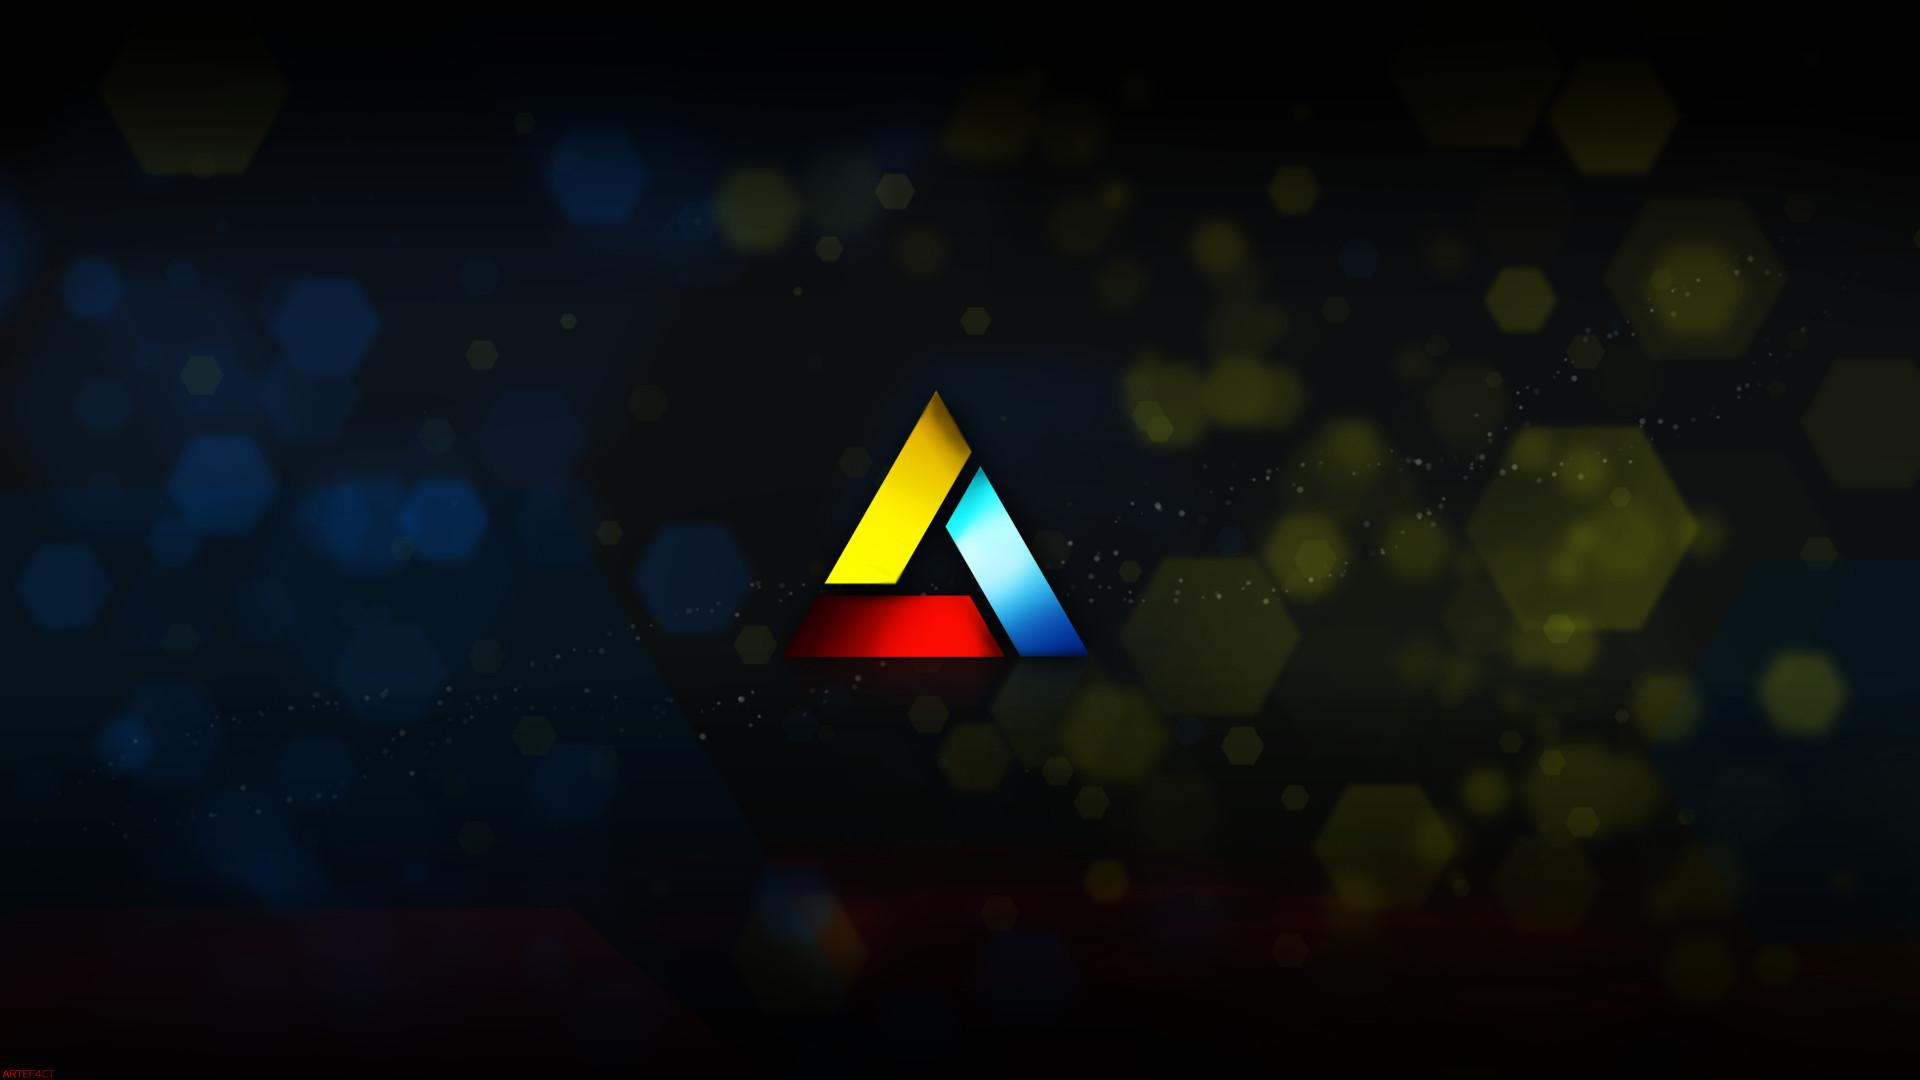 Assassin's Creed III – Animus assassin__s_creed_iii___animus